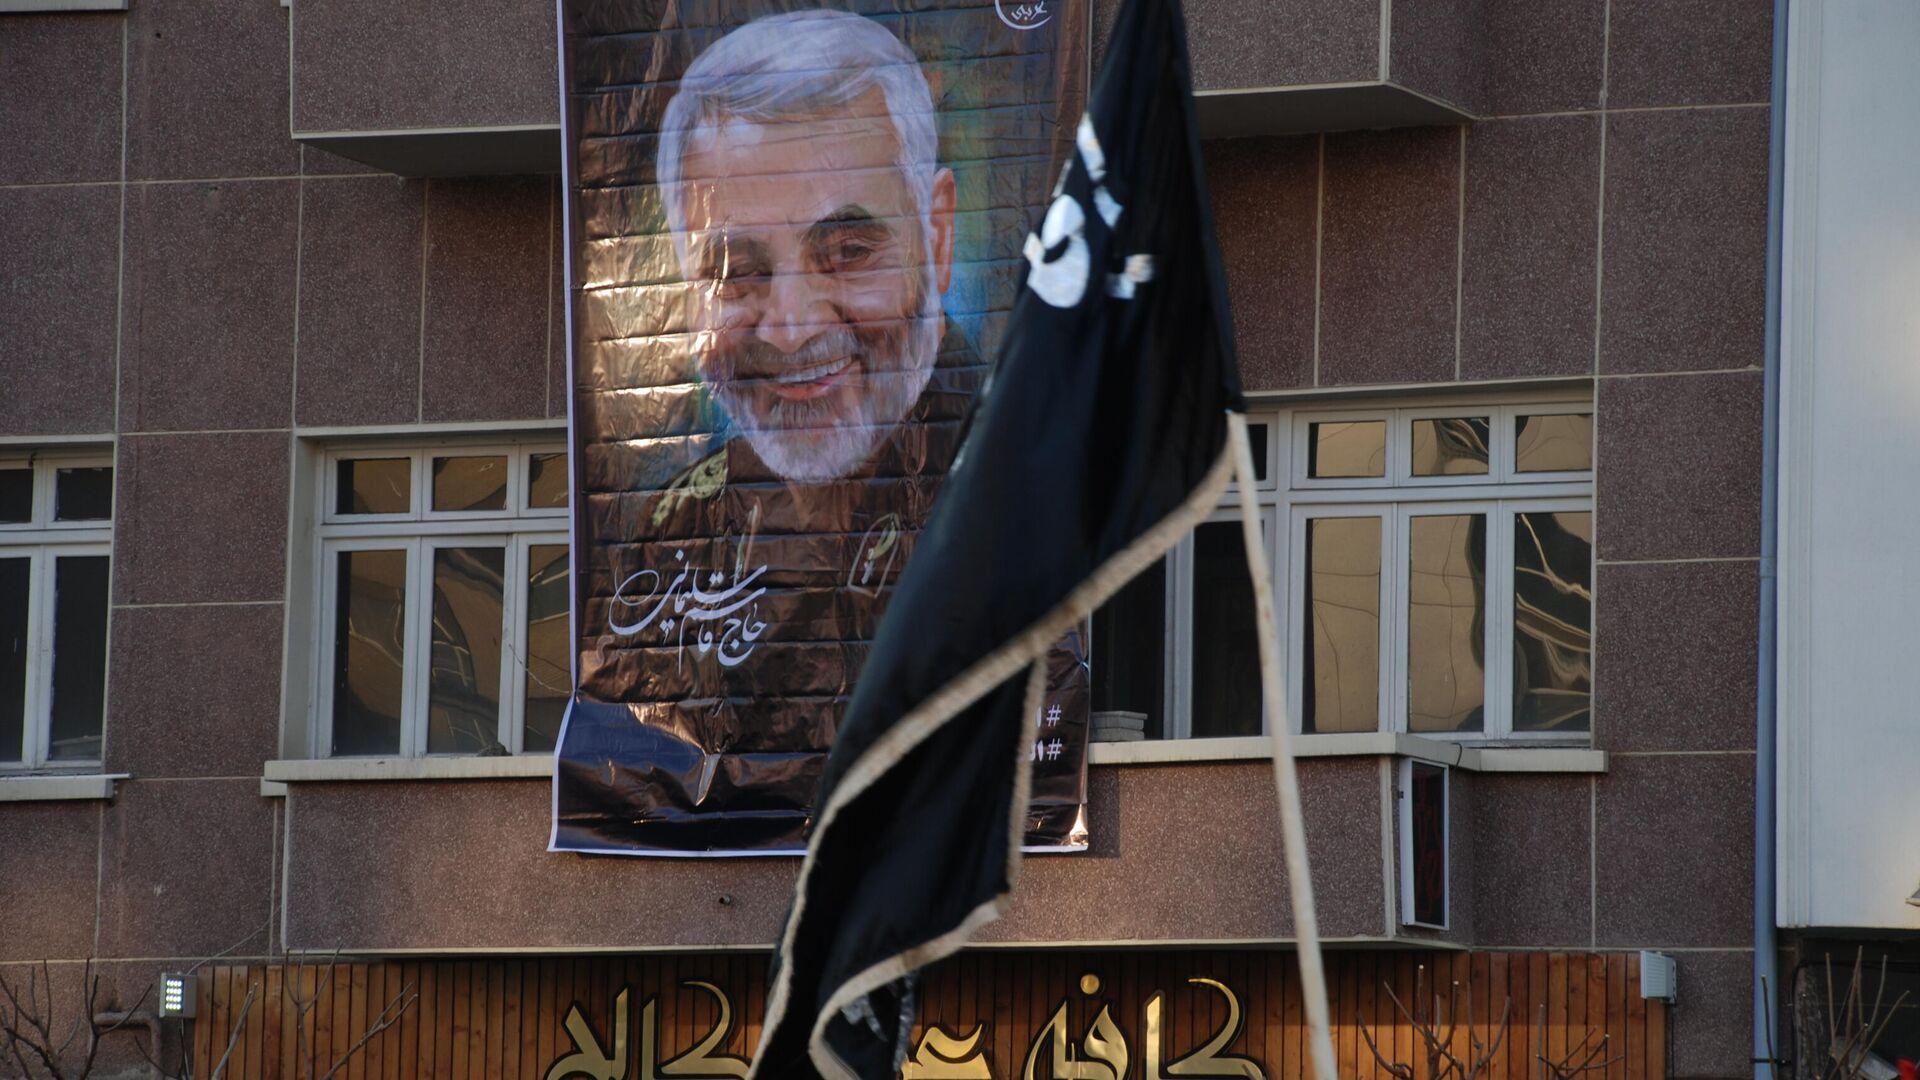 Прощание с Касемом Сулеймани в Тегеране. 6 января 2020 - РИА Новости, 1920, 31.12.2020